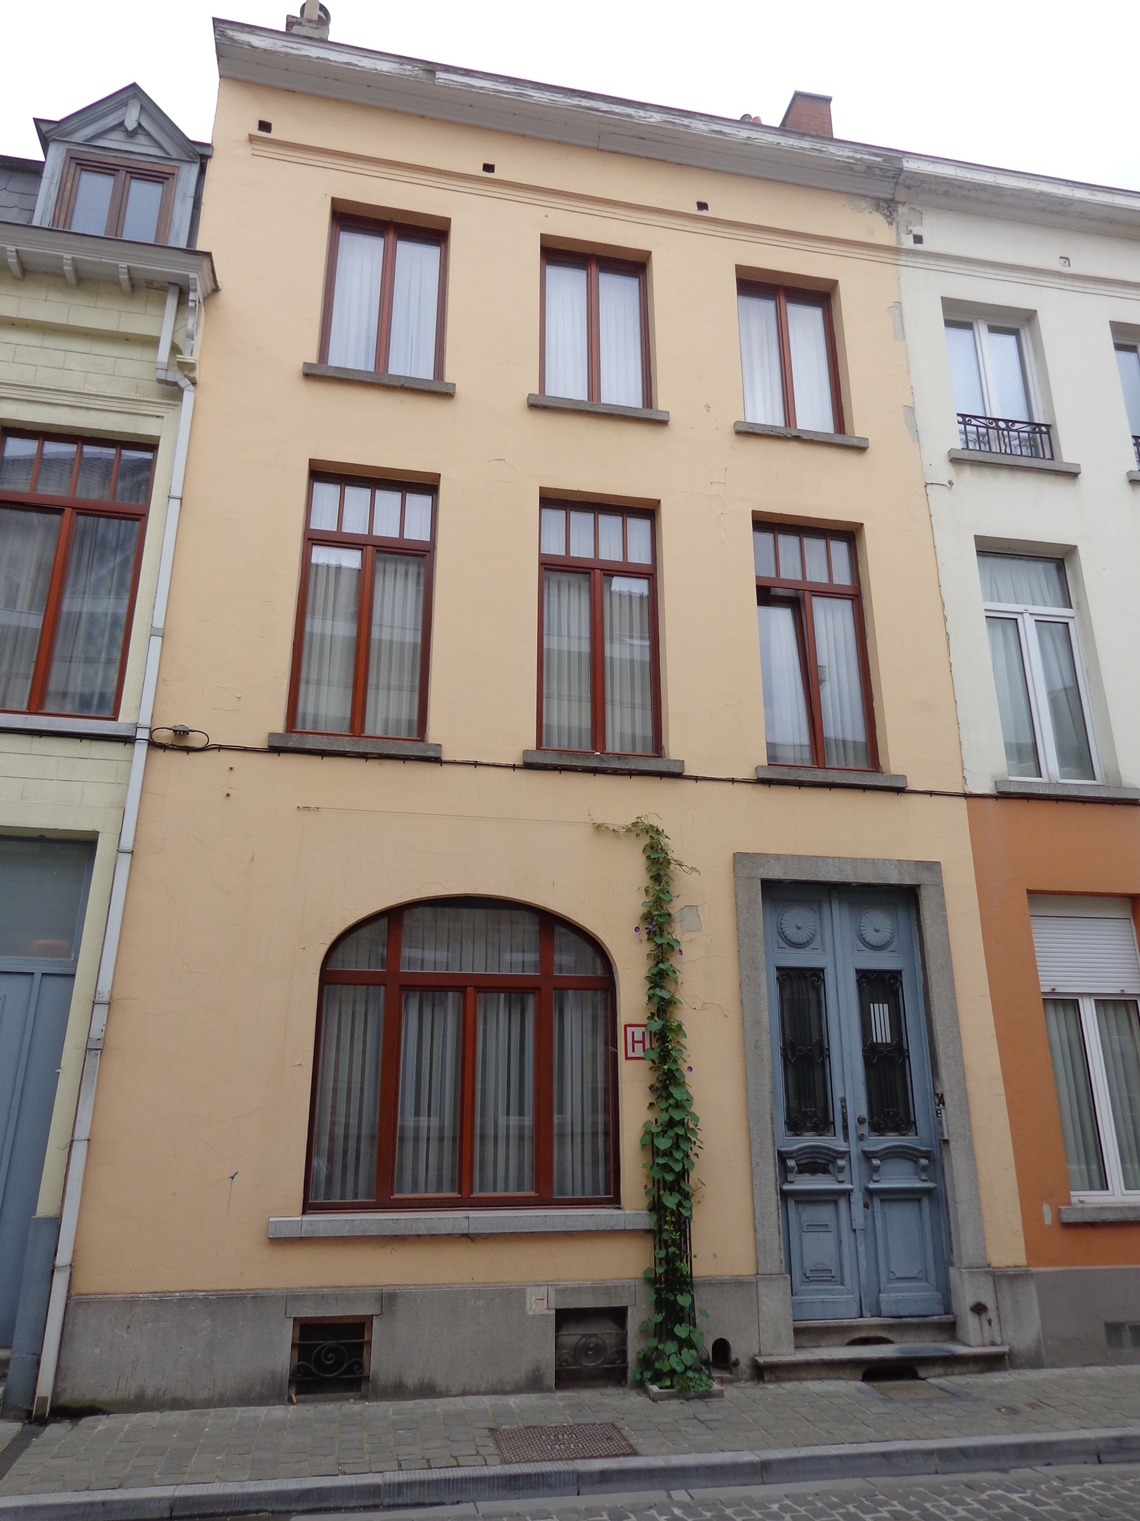 Rue du Boulet 34, 2015